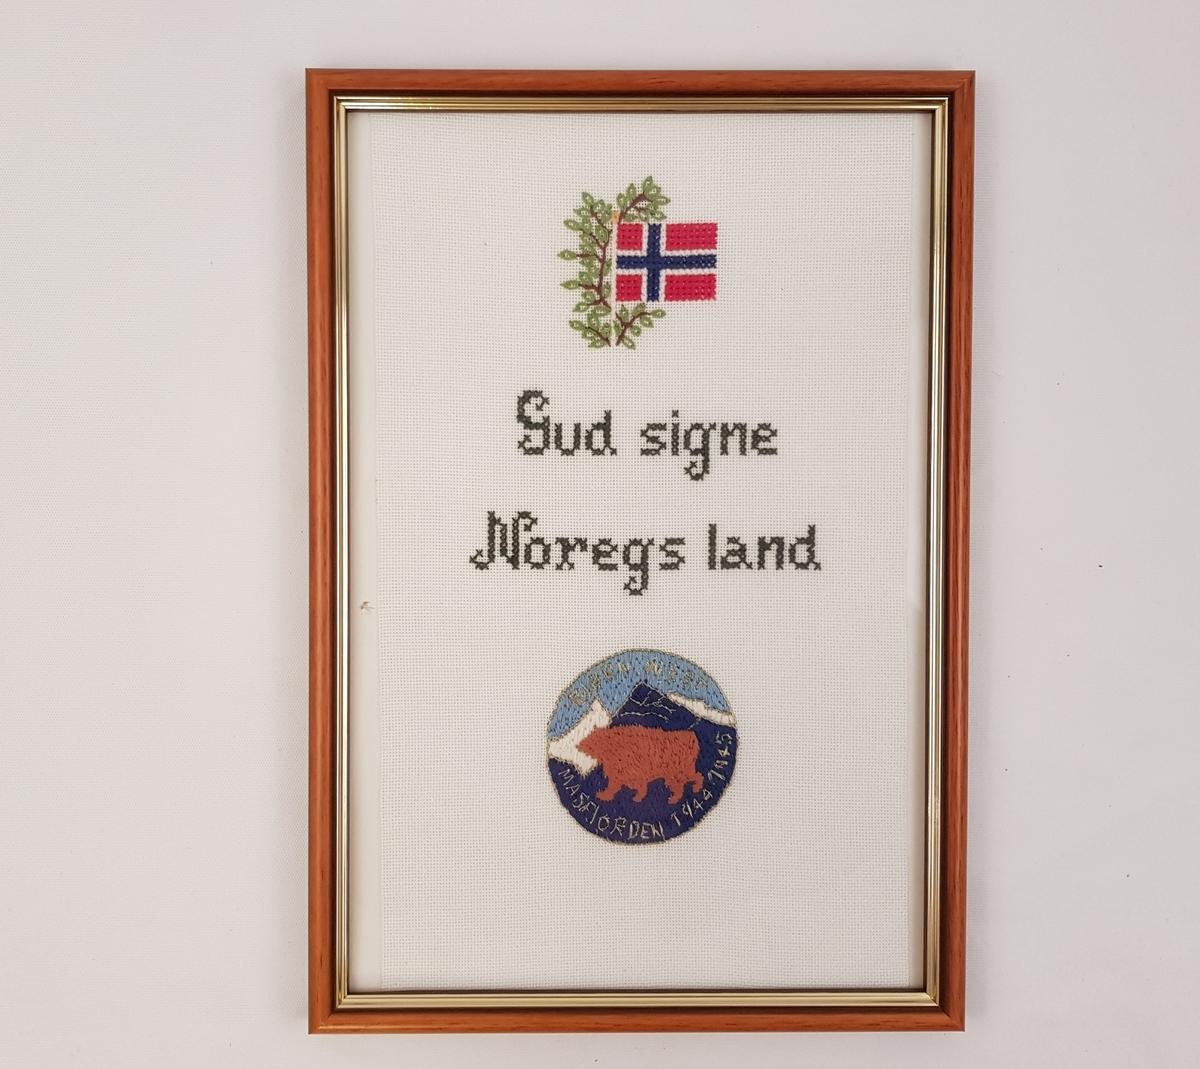 Broderi i ramme med norsk flagg, Bjørn West-merket og påskrift.